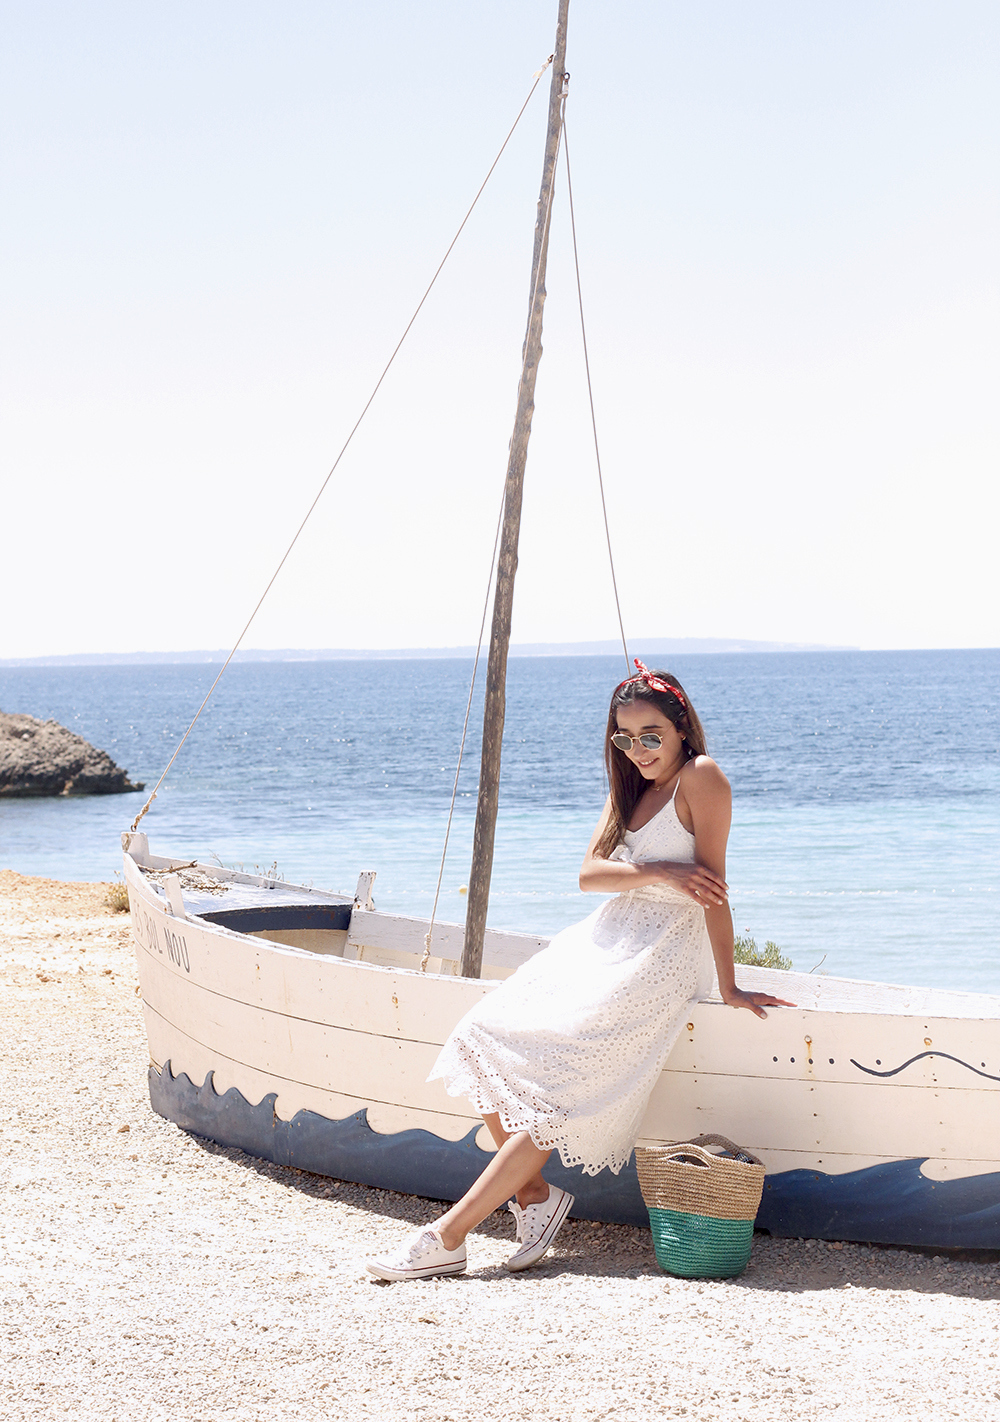 white summer dress white converse rayban sunglasses 2019 street style outfit vacation ibiza8